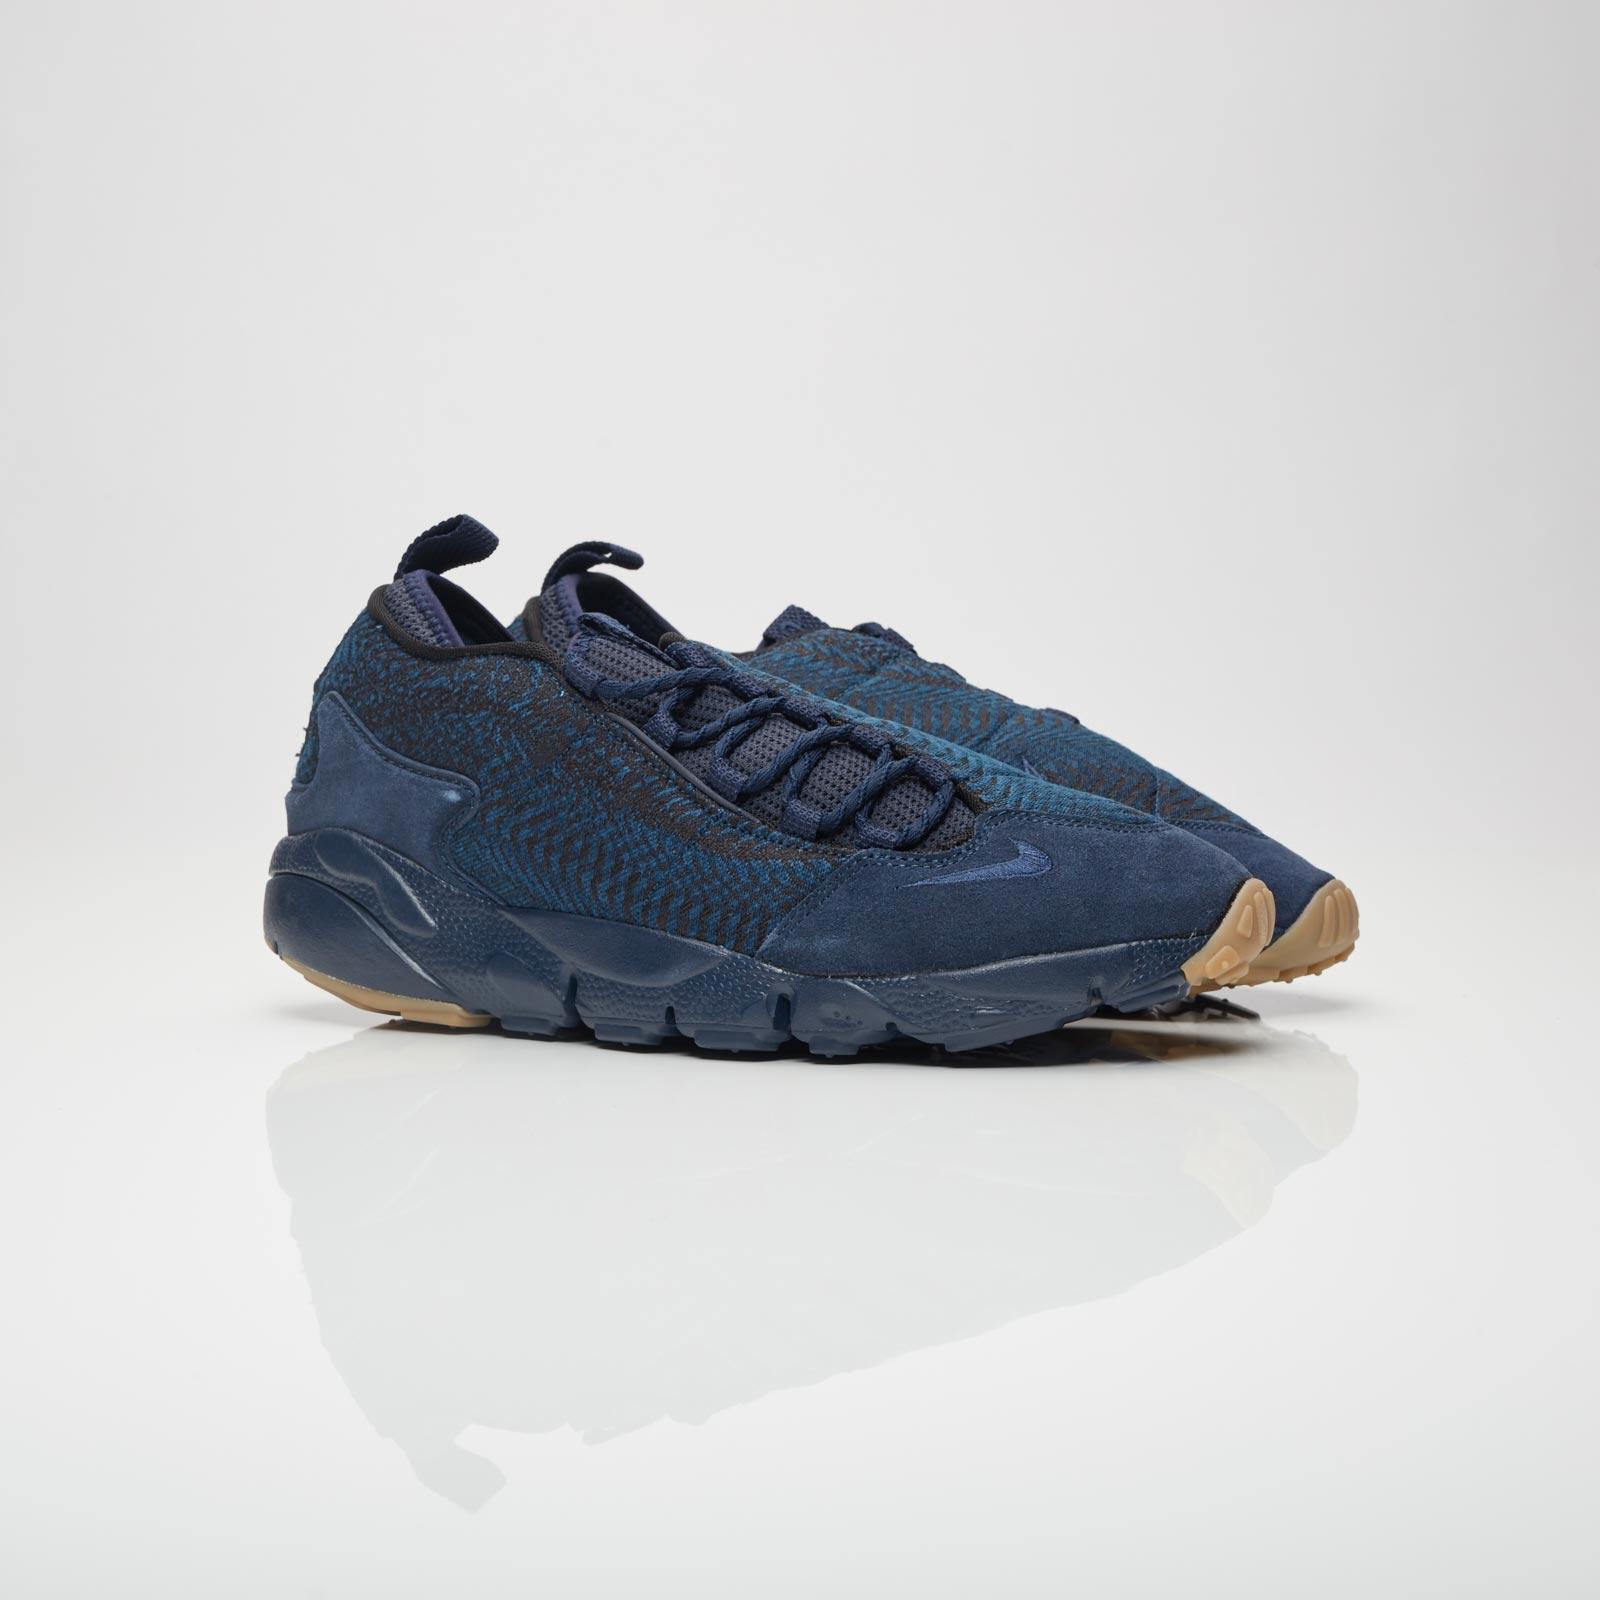 fa0e46927589 Nike Air Footscape NM Premium - 918357-400 - Sneakersnstuff ...